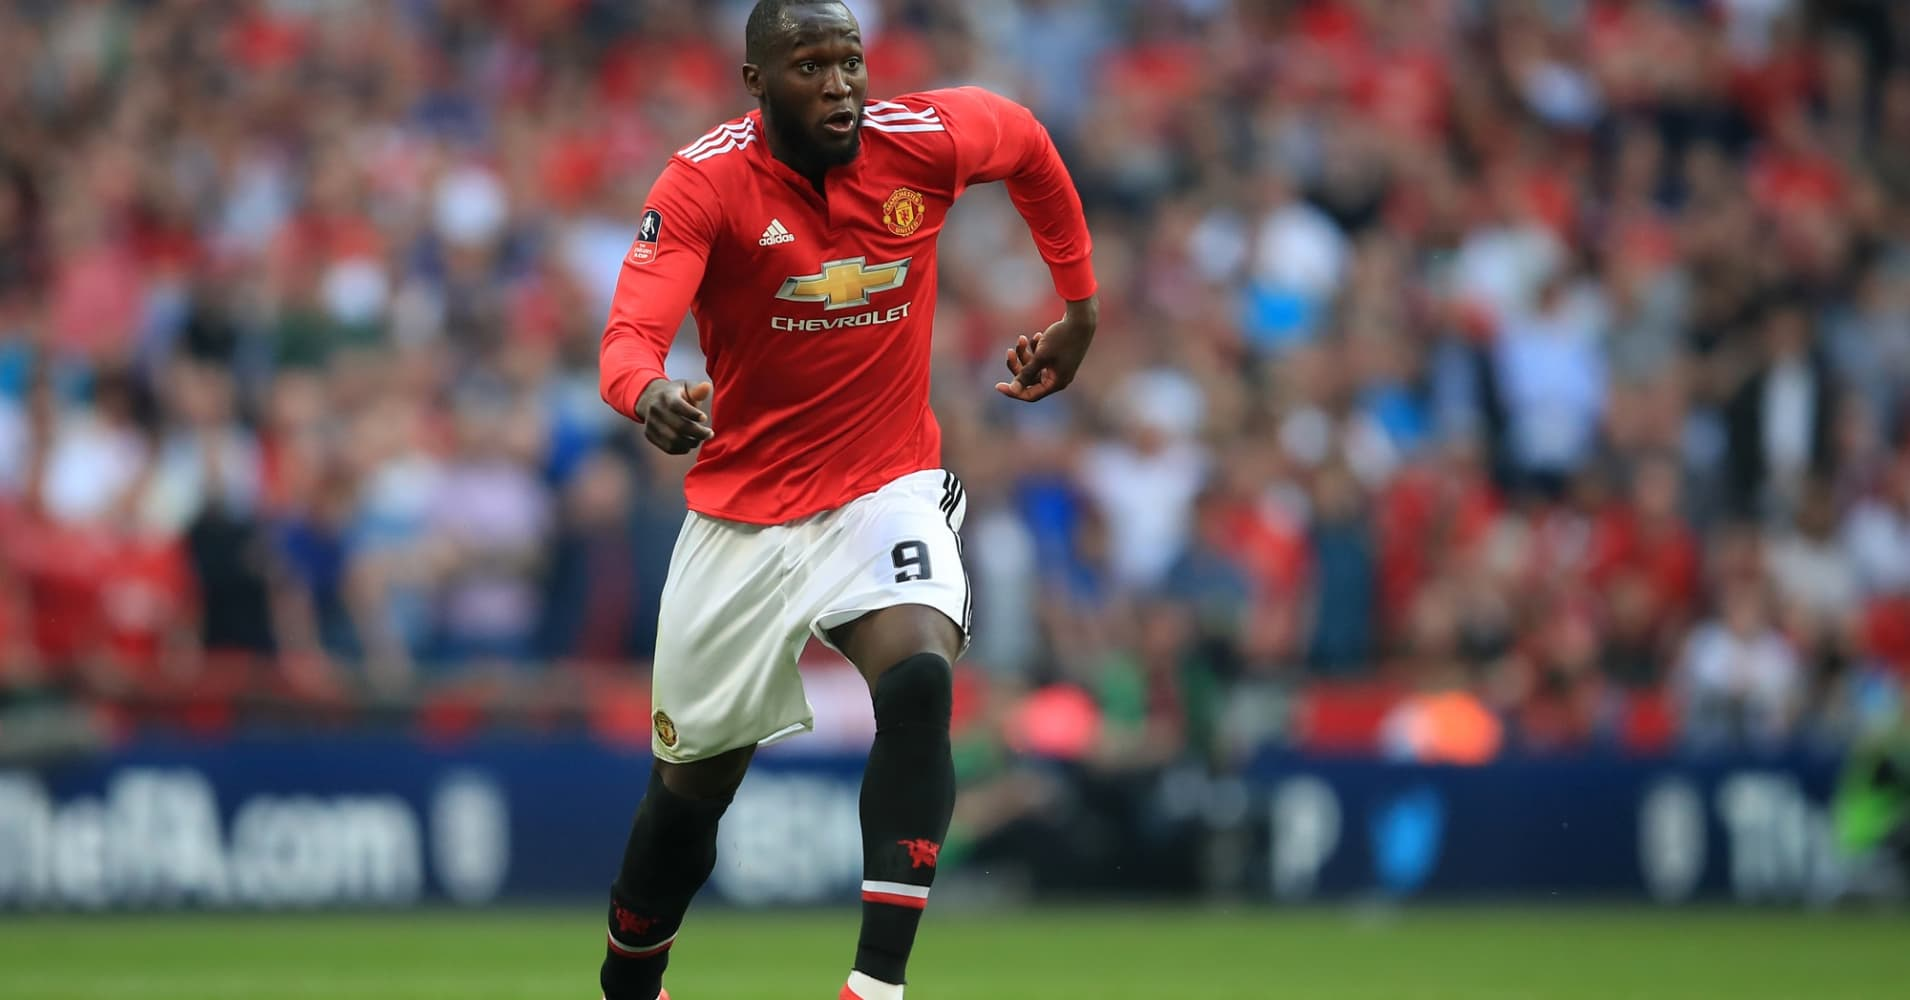 Romelu Lukaku plays for Manchester United